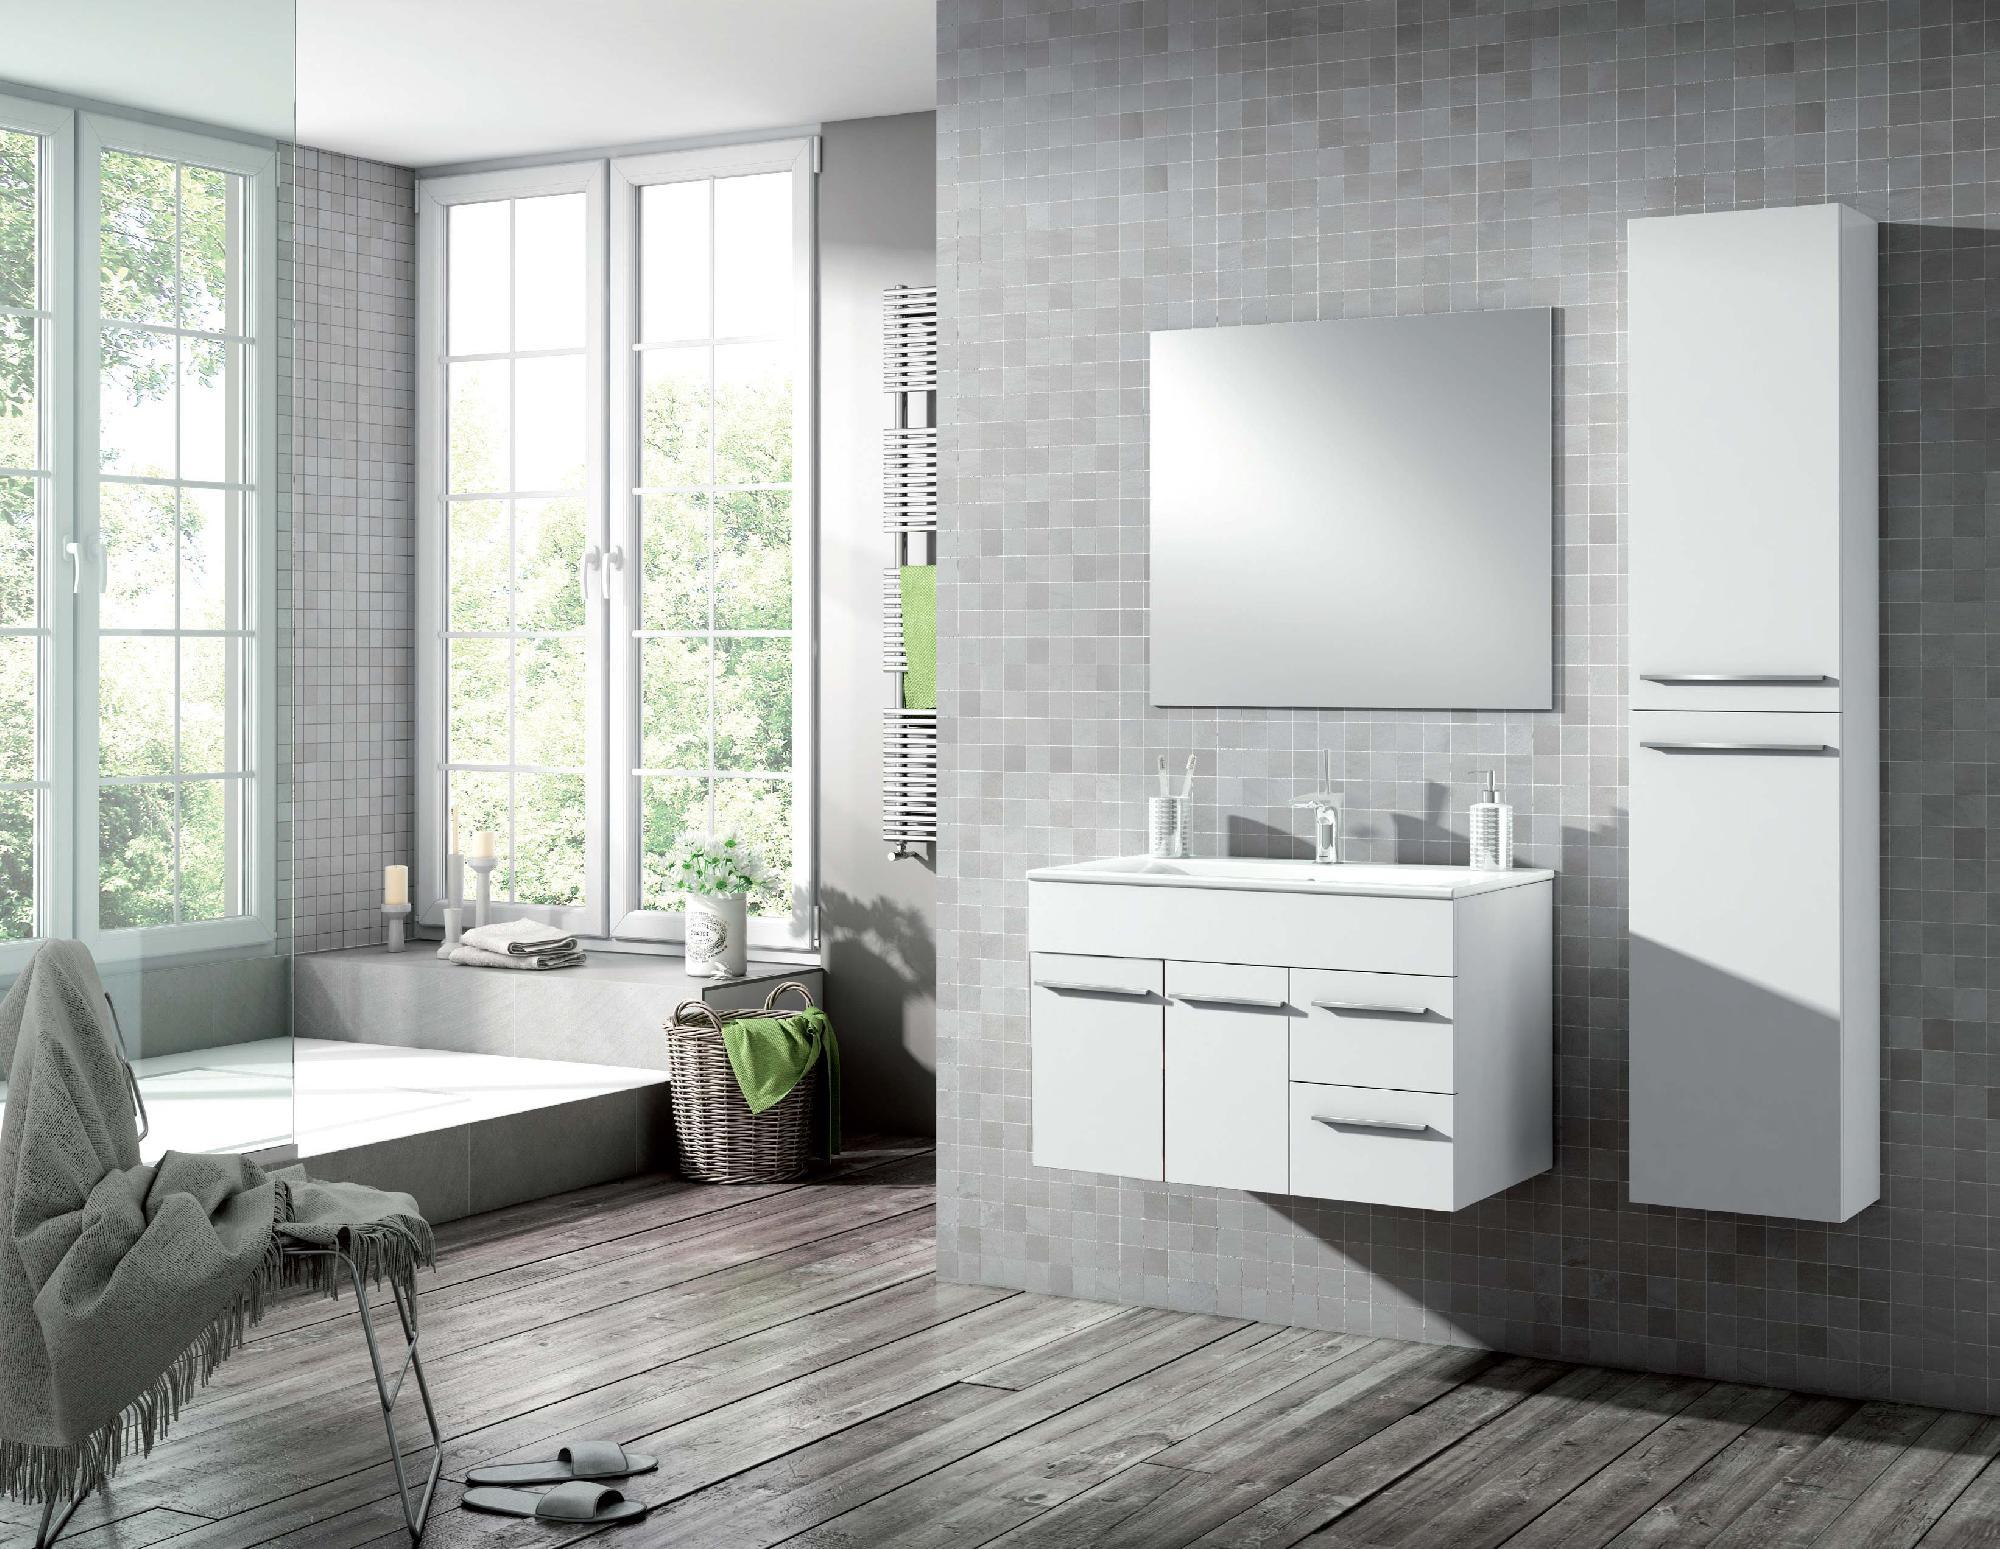 Mueble de baño colección Europa 2 puertas